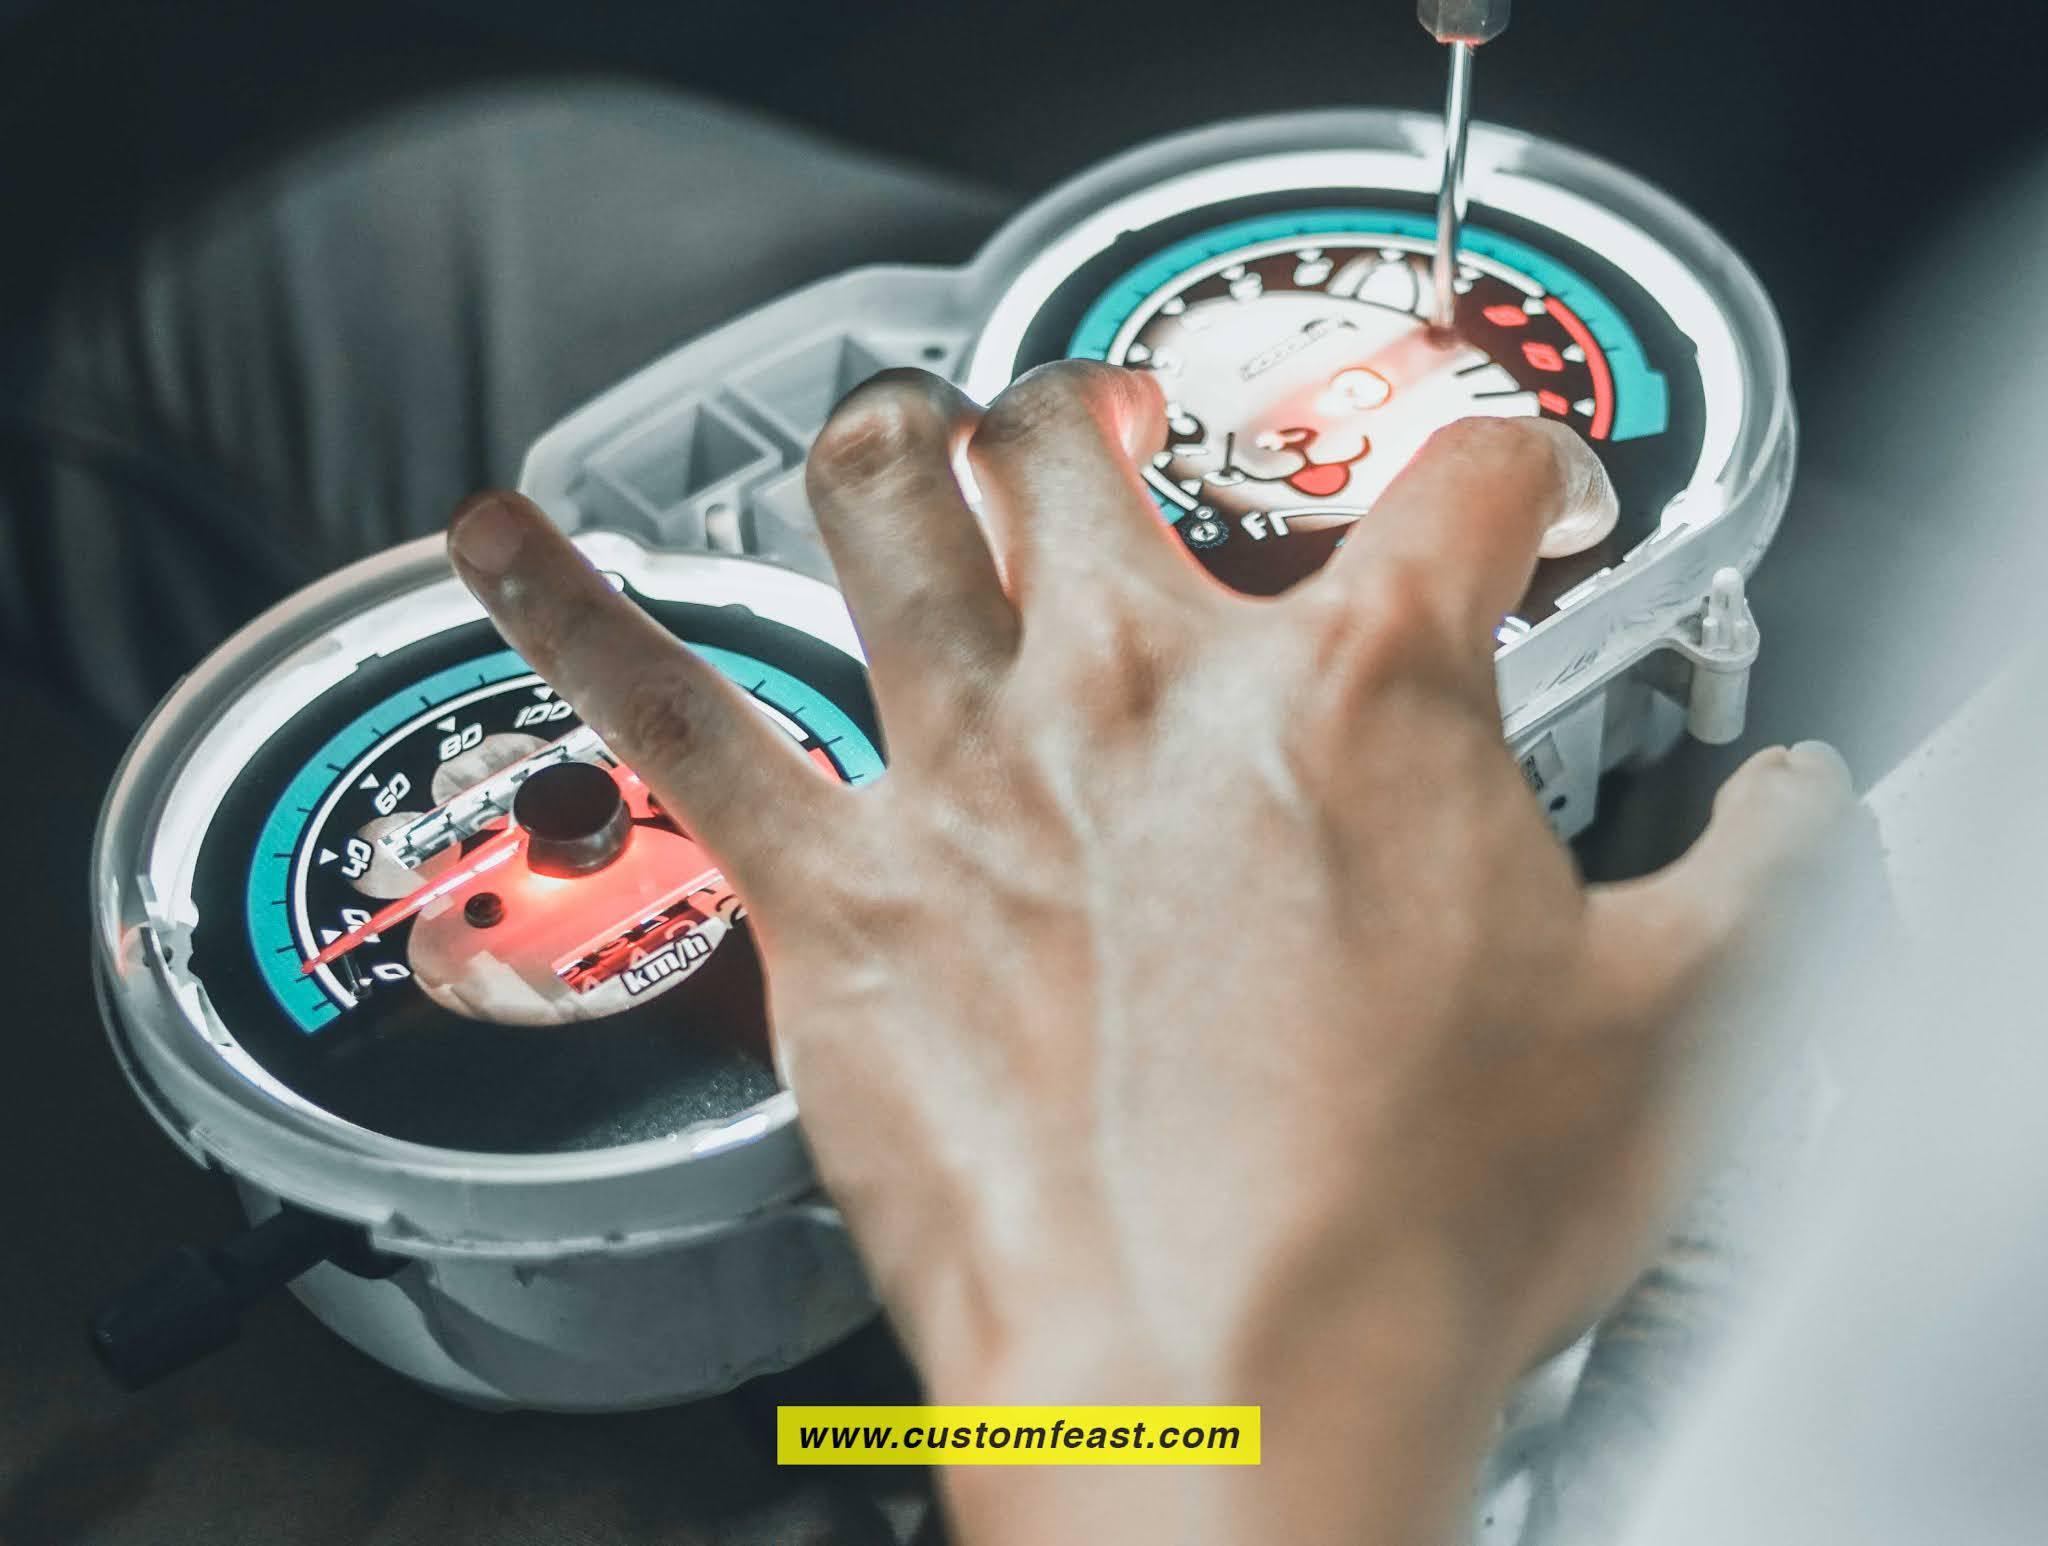 Speedometer Tiger revo custom